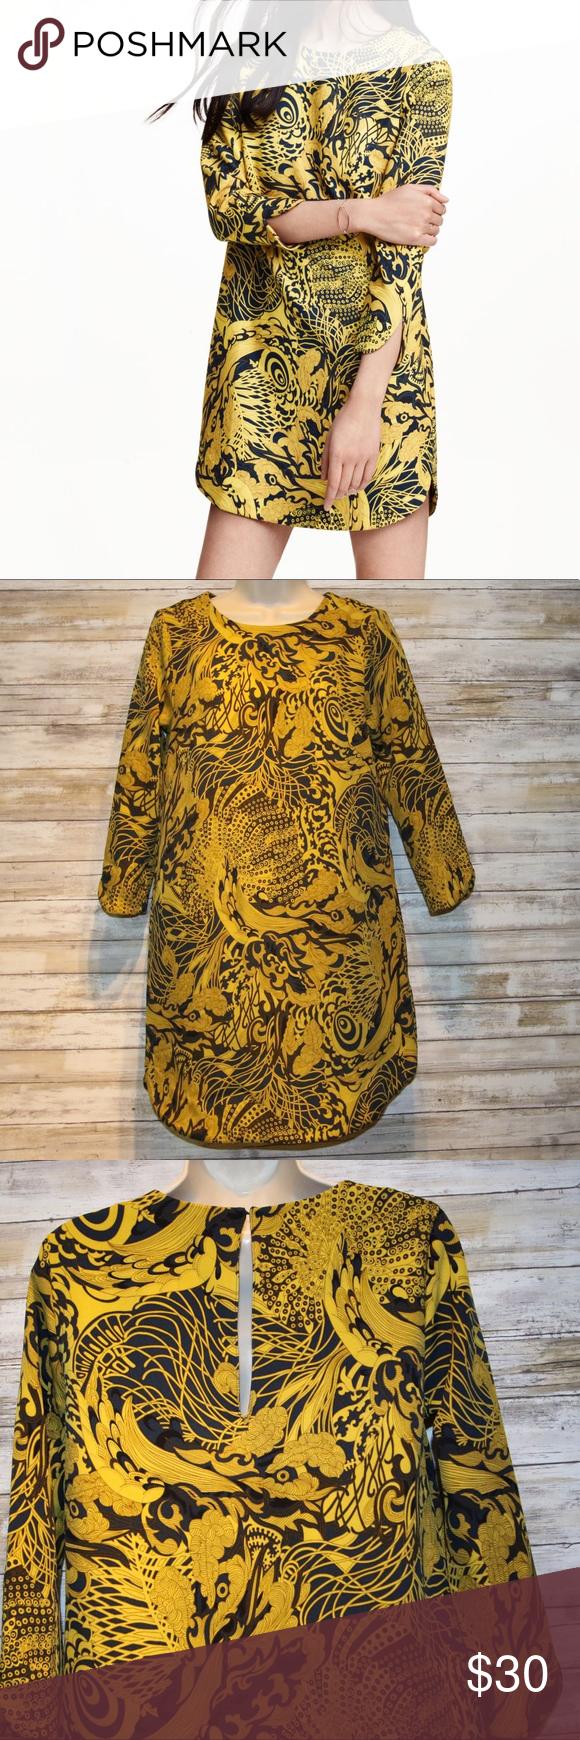 H M Gold Navy 3 4 Sleeve Shift Dress Sz 6 Clothes Design Fashion Design Navy Shift Dress [ 1740 x 580 Pixel ]